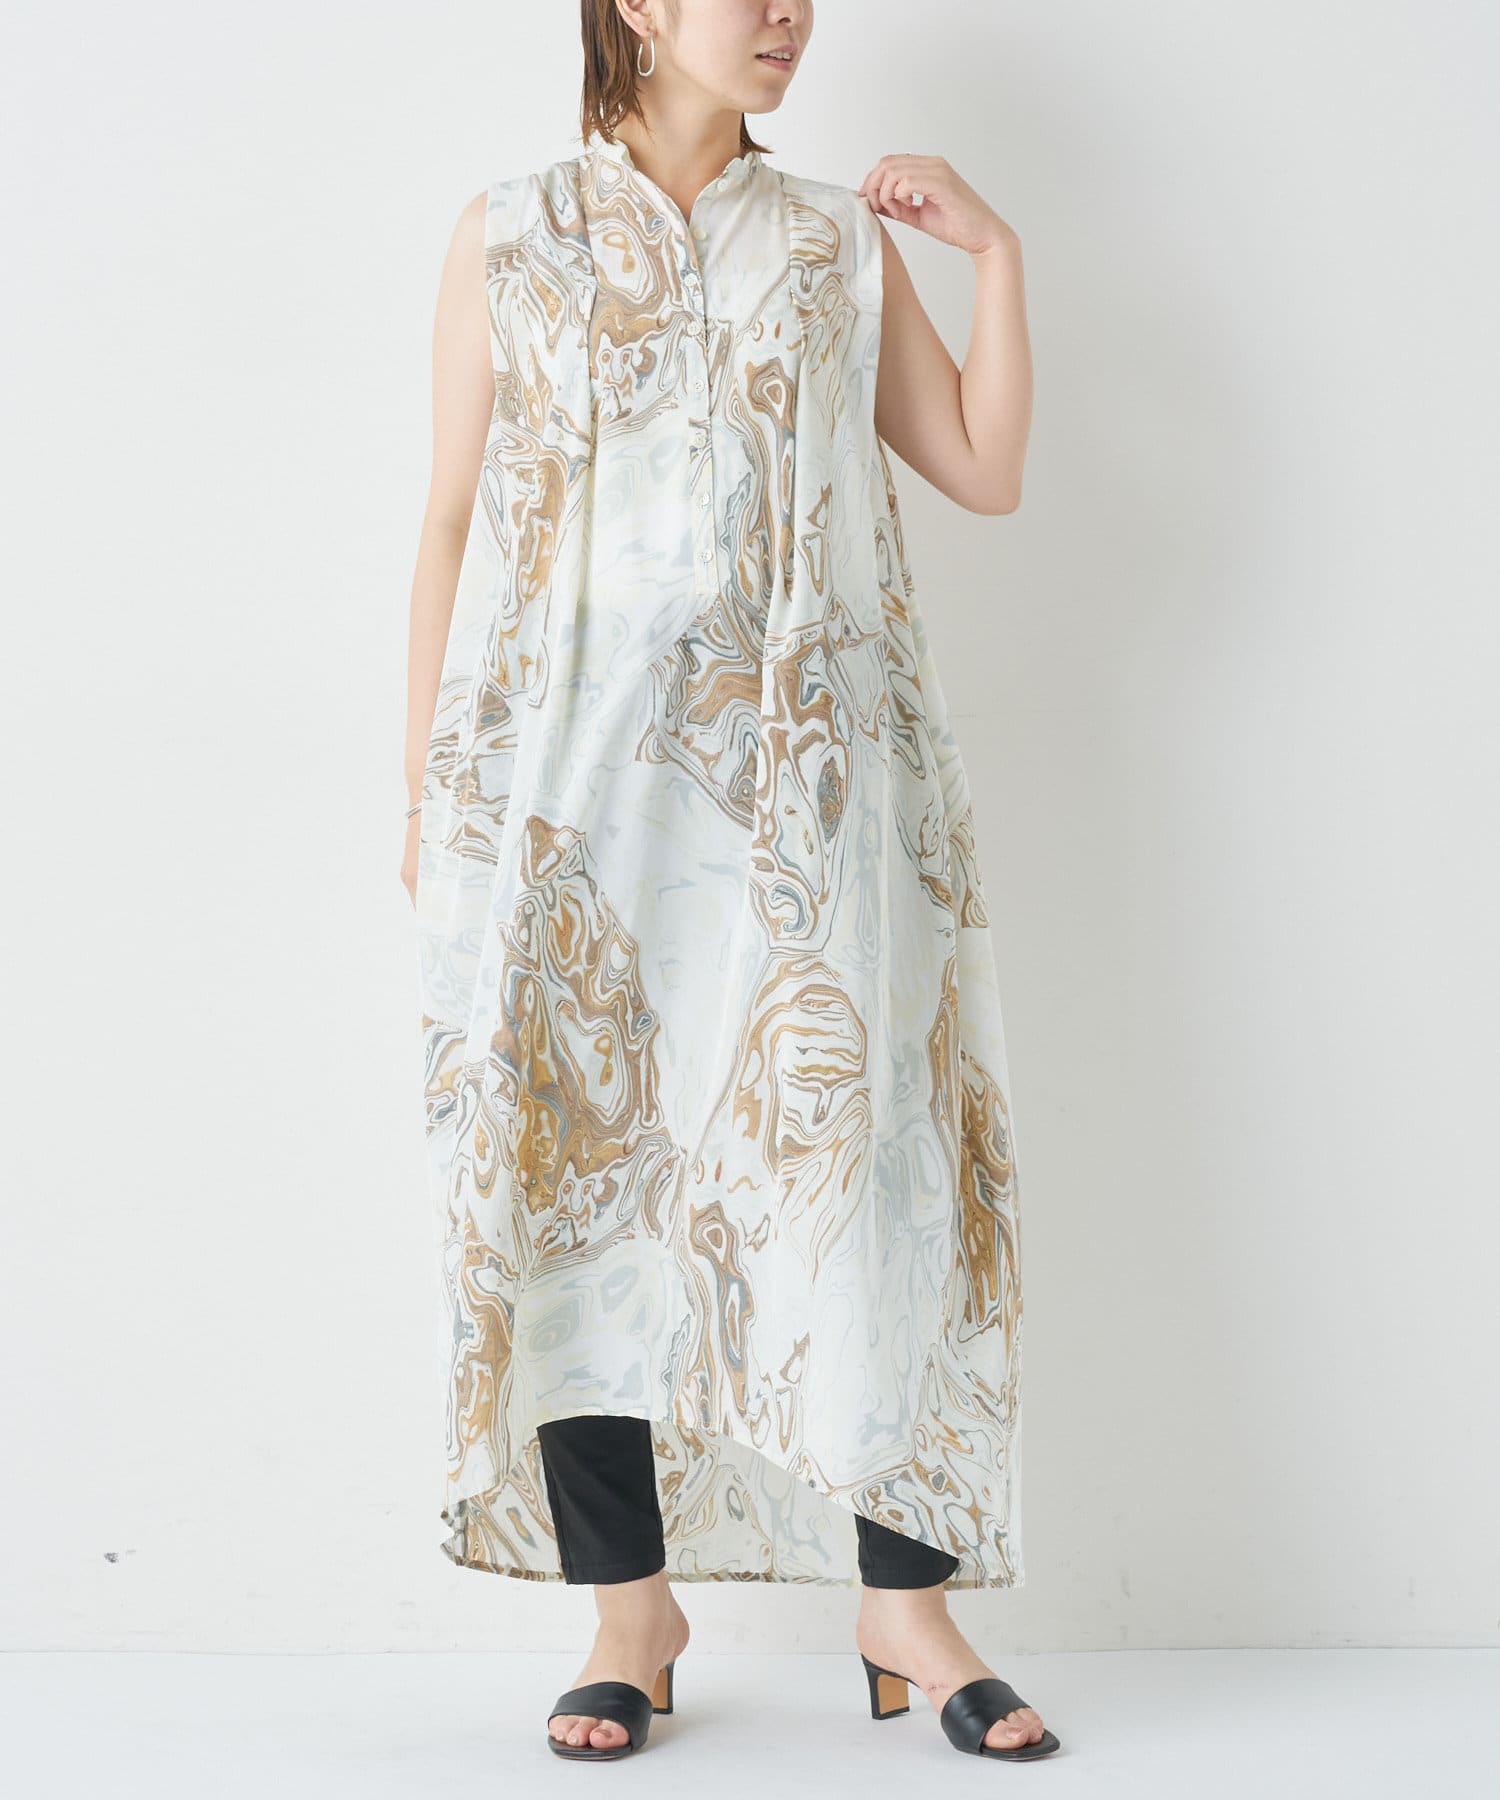 BONbazaar(ボンバザール) 《動画付き》【Dessin de Mode】京都マーブルバルーンワンピース